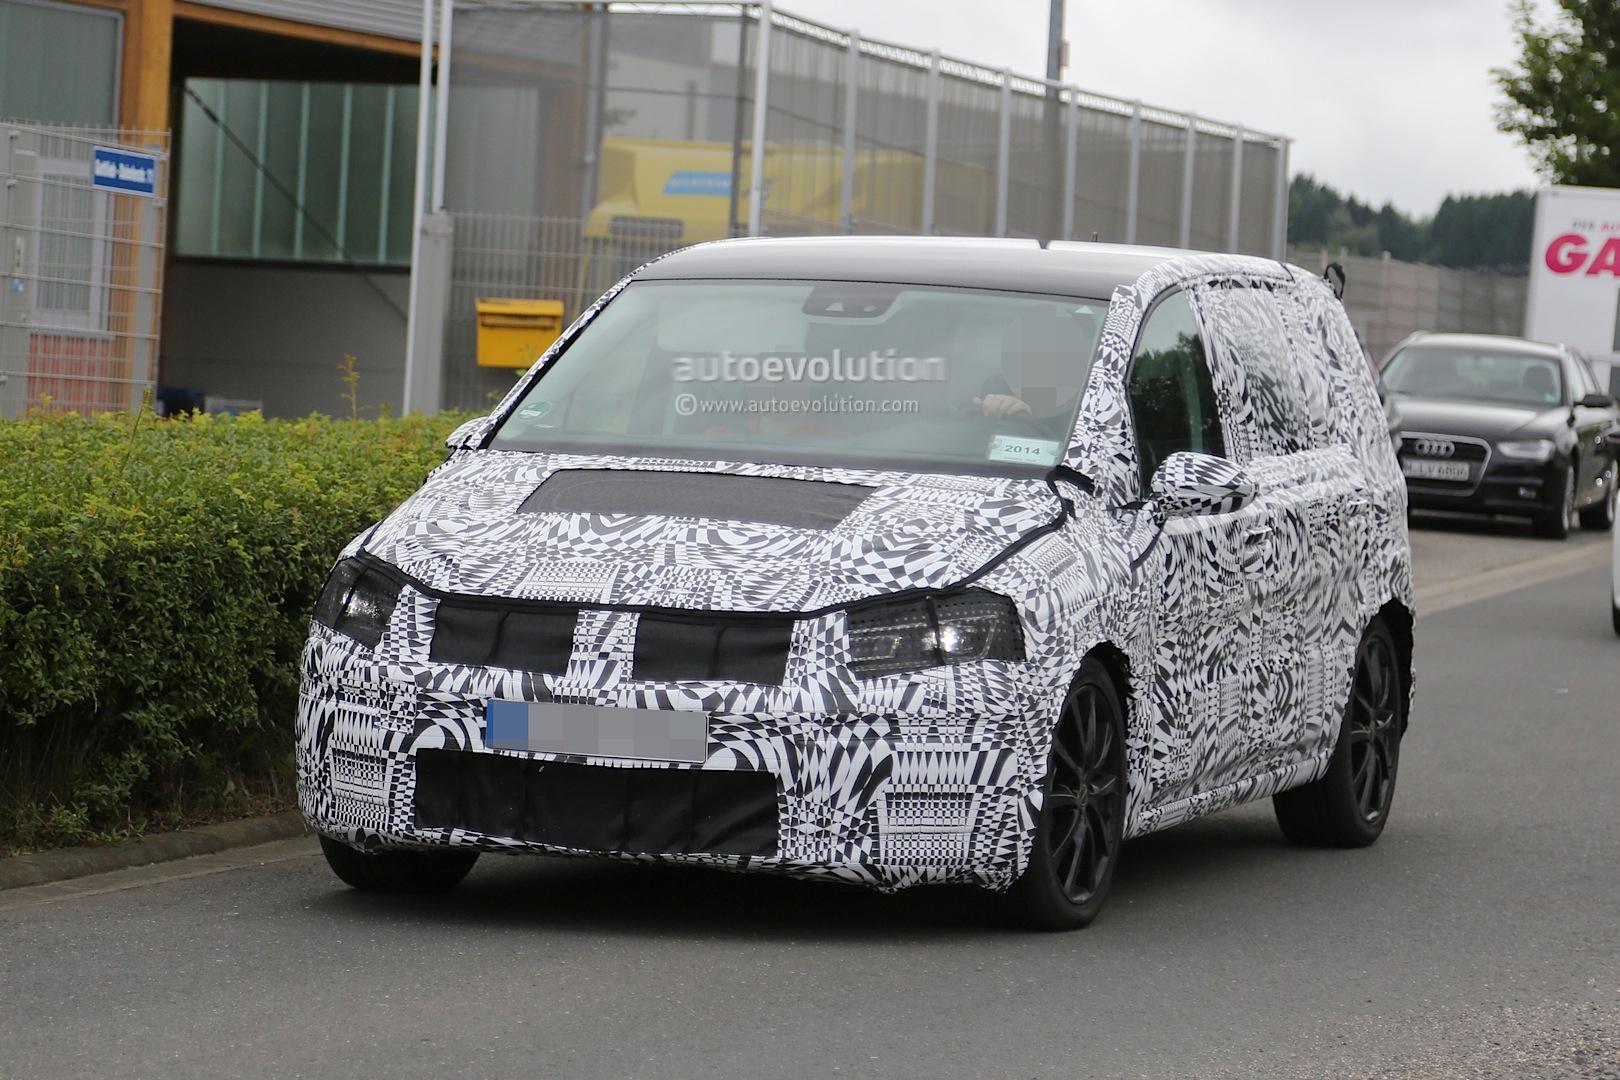 2015 - [Volkswagen] Touran - Page 3 2015-volkswagen-touran-spied-with-led-headlights_9